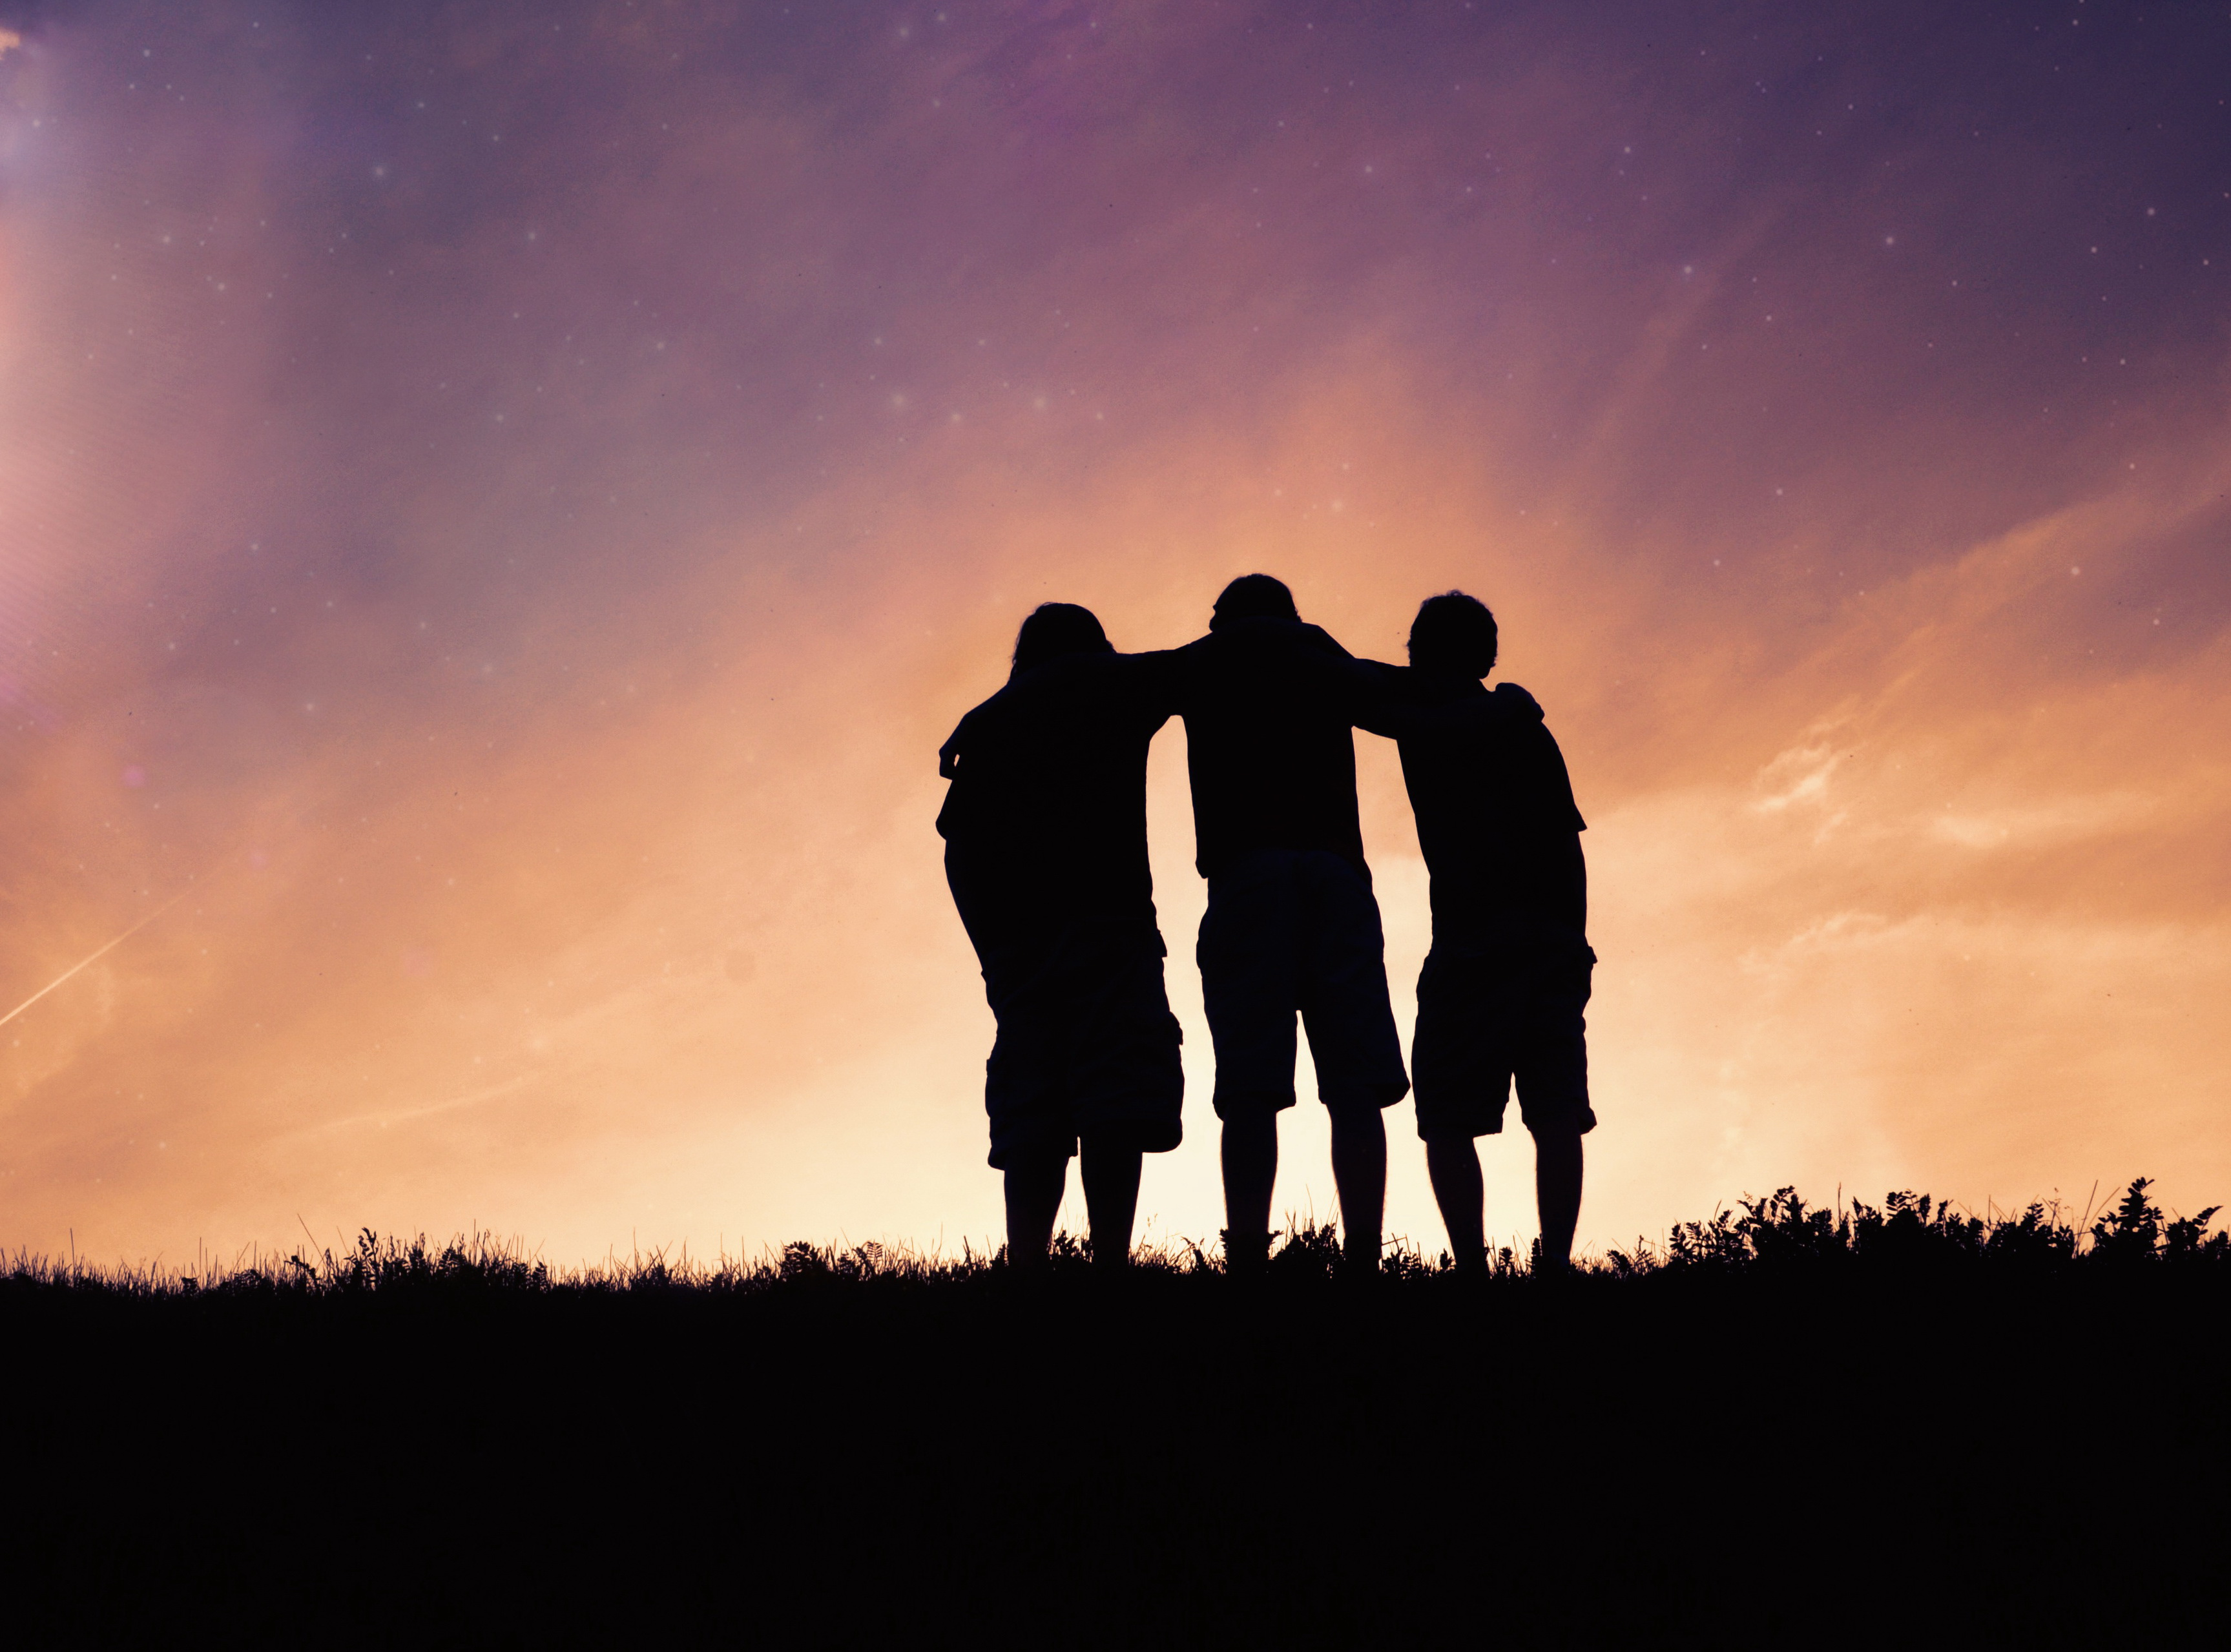 Grup d'ajuda mútua - Grupo de apoyo mutuo